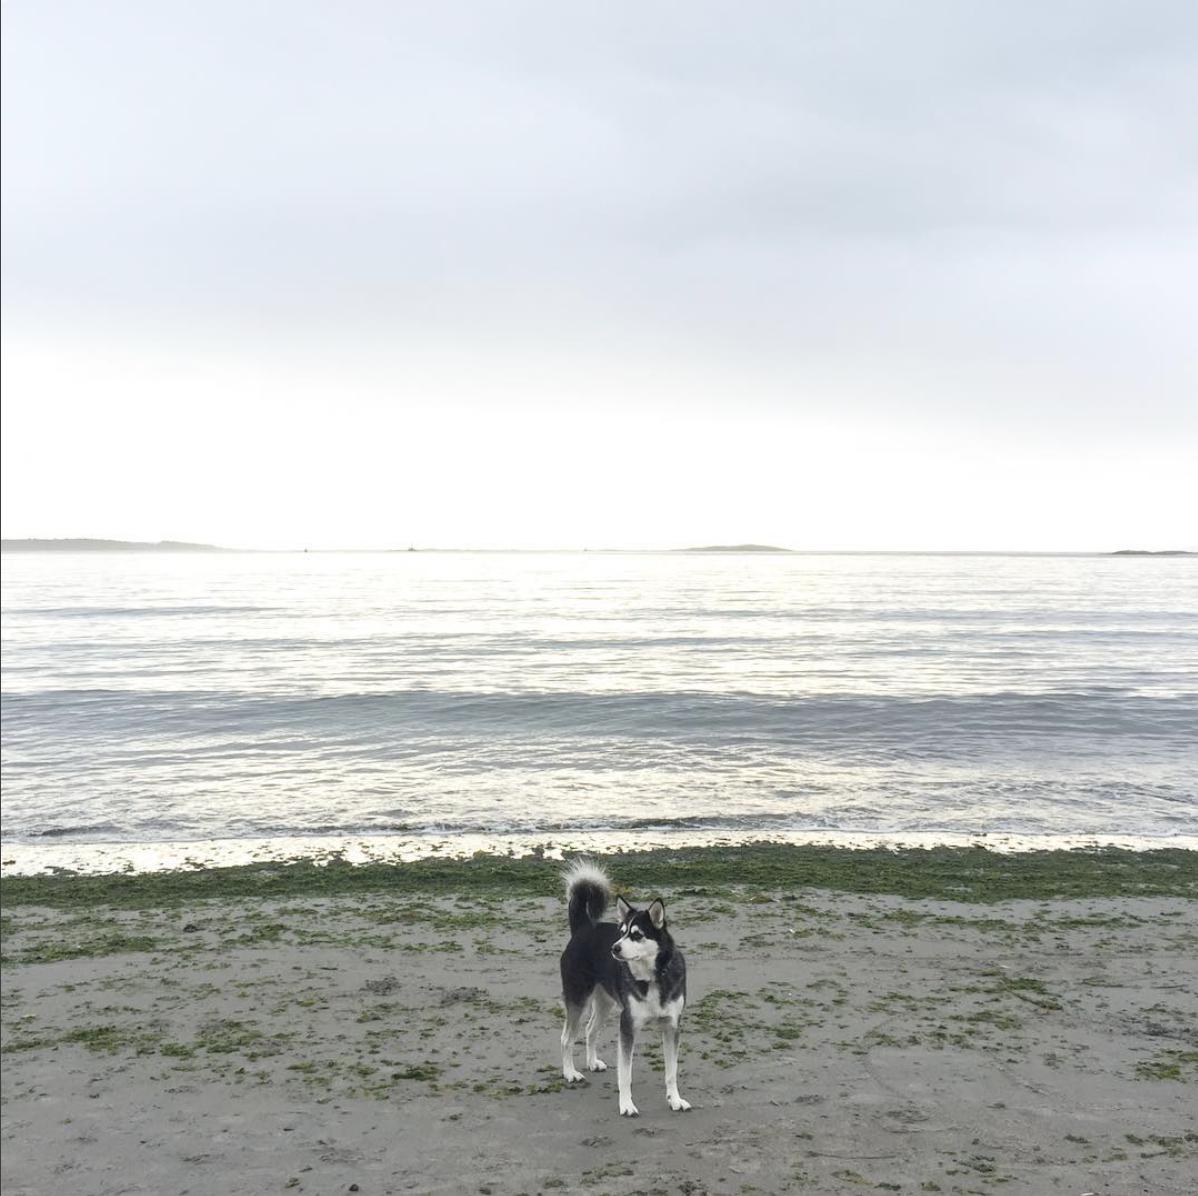 Barb: Long dog walks